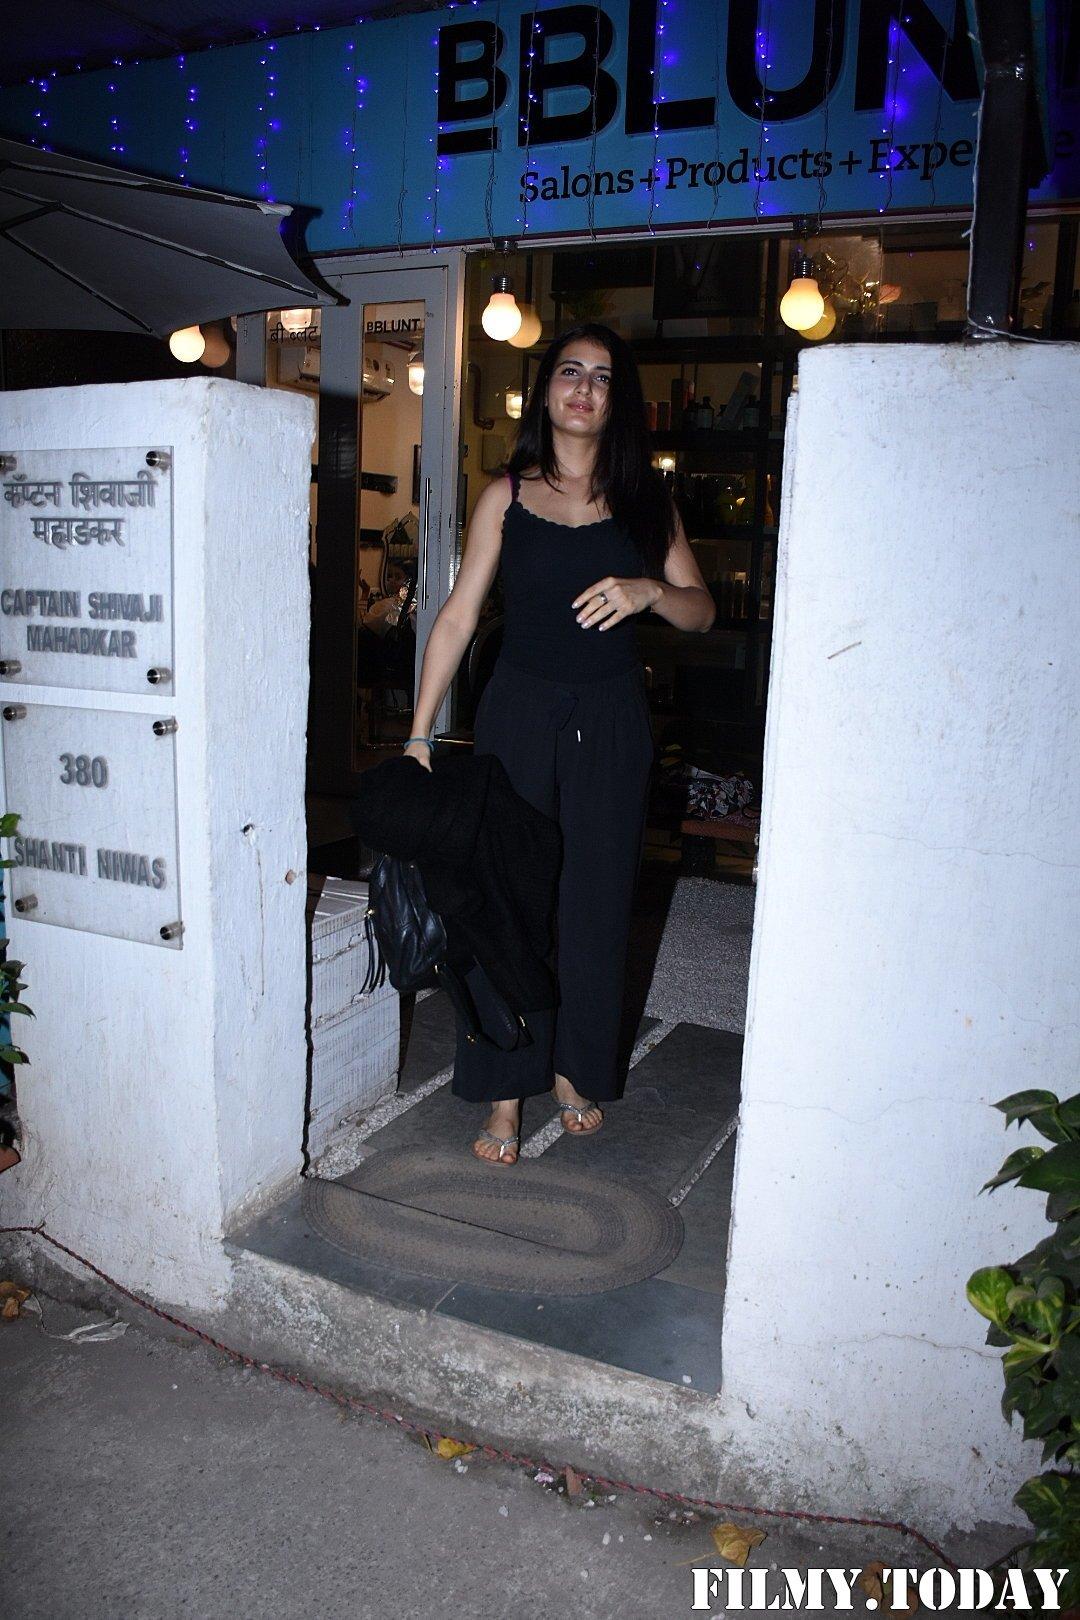 Fatima Sana Shaikh - Photos: Celebs Spotted Bblunt Salon At Bandra | Picture 1711926